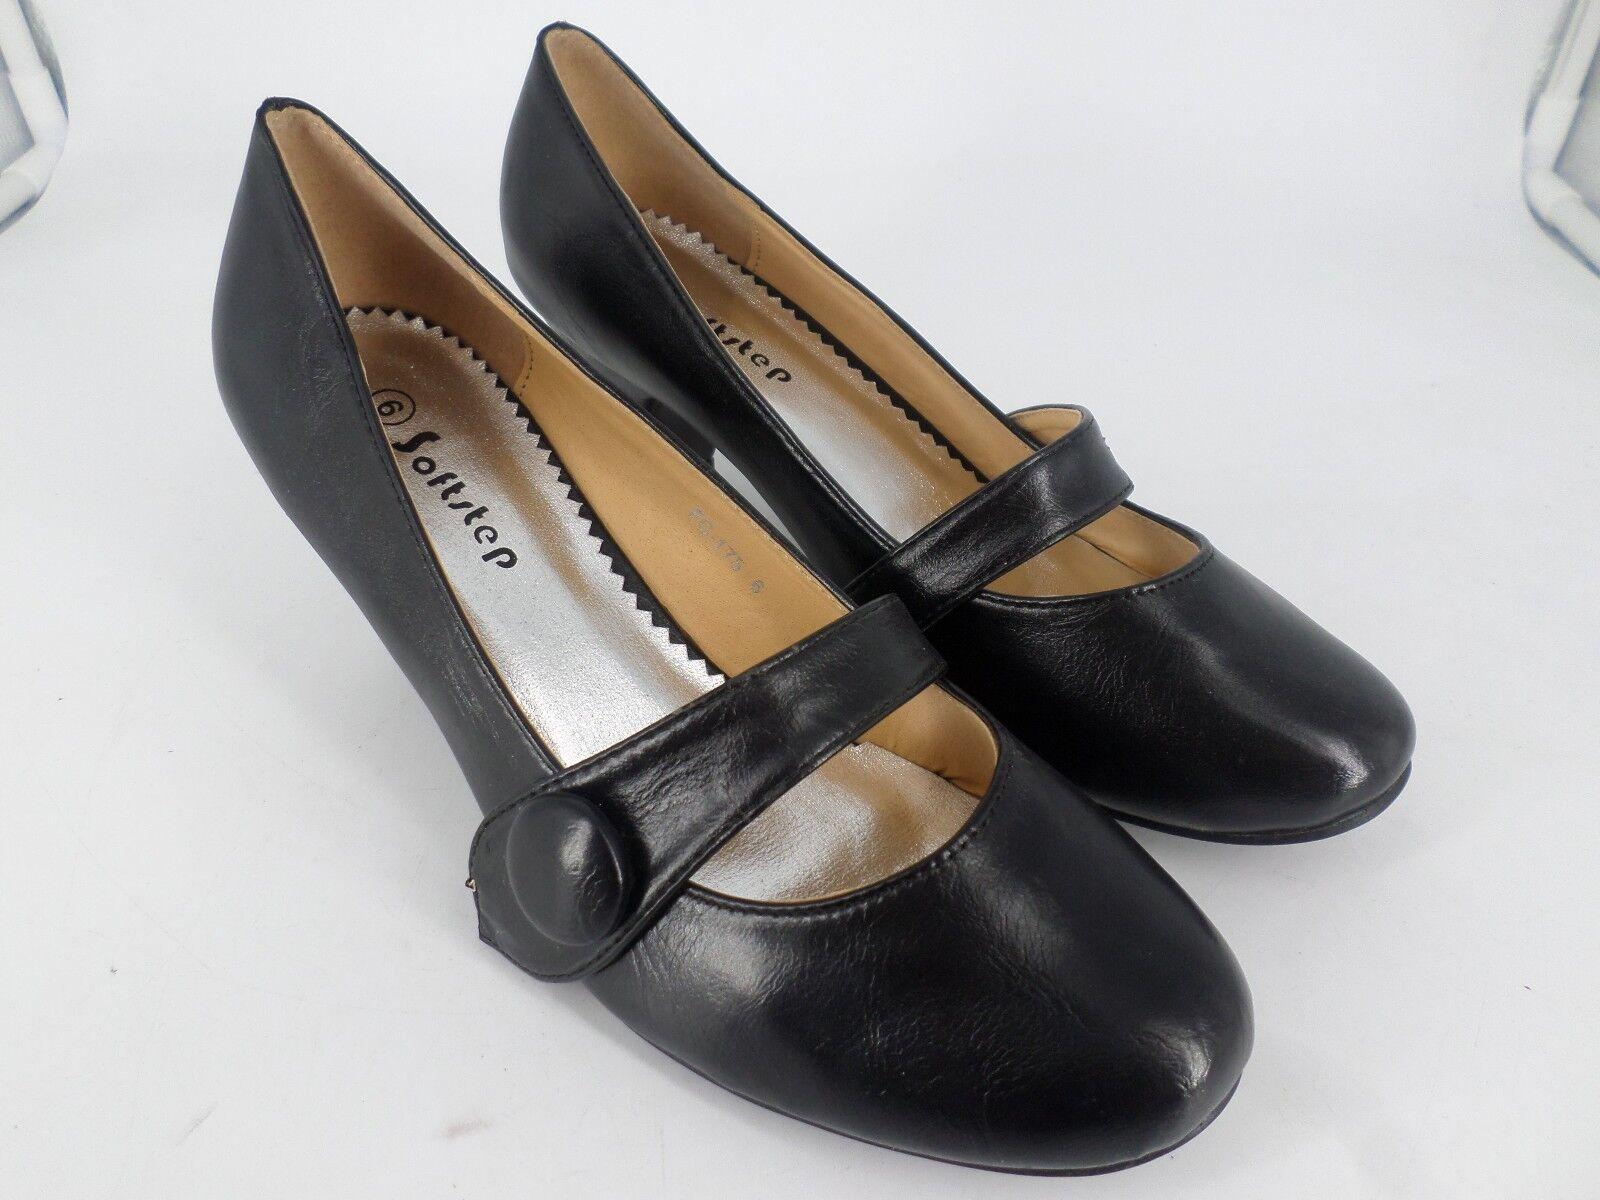 Soft Step Ladies Black Low Heeled Court Shoes UK 6 EU 39 LN36 07